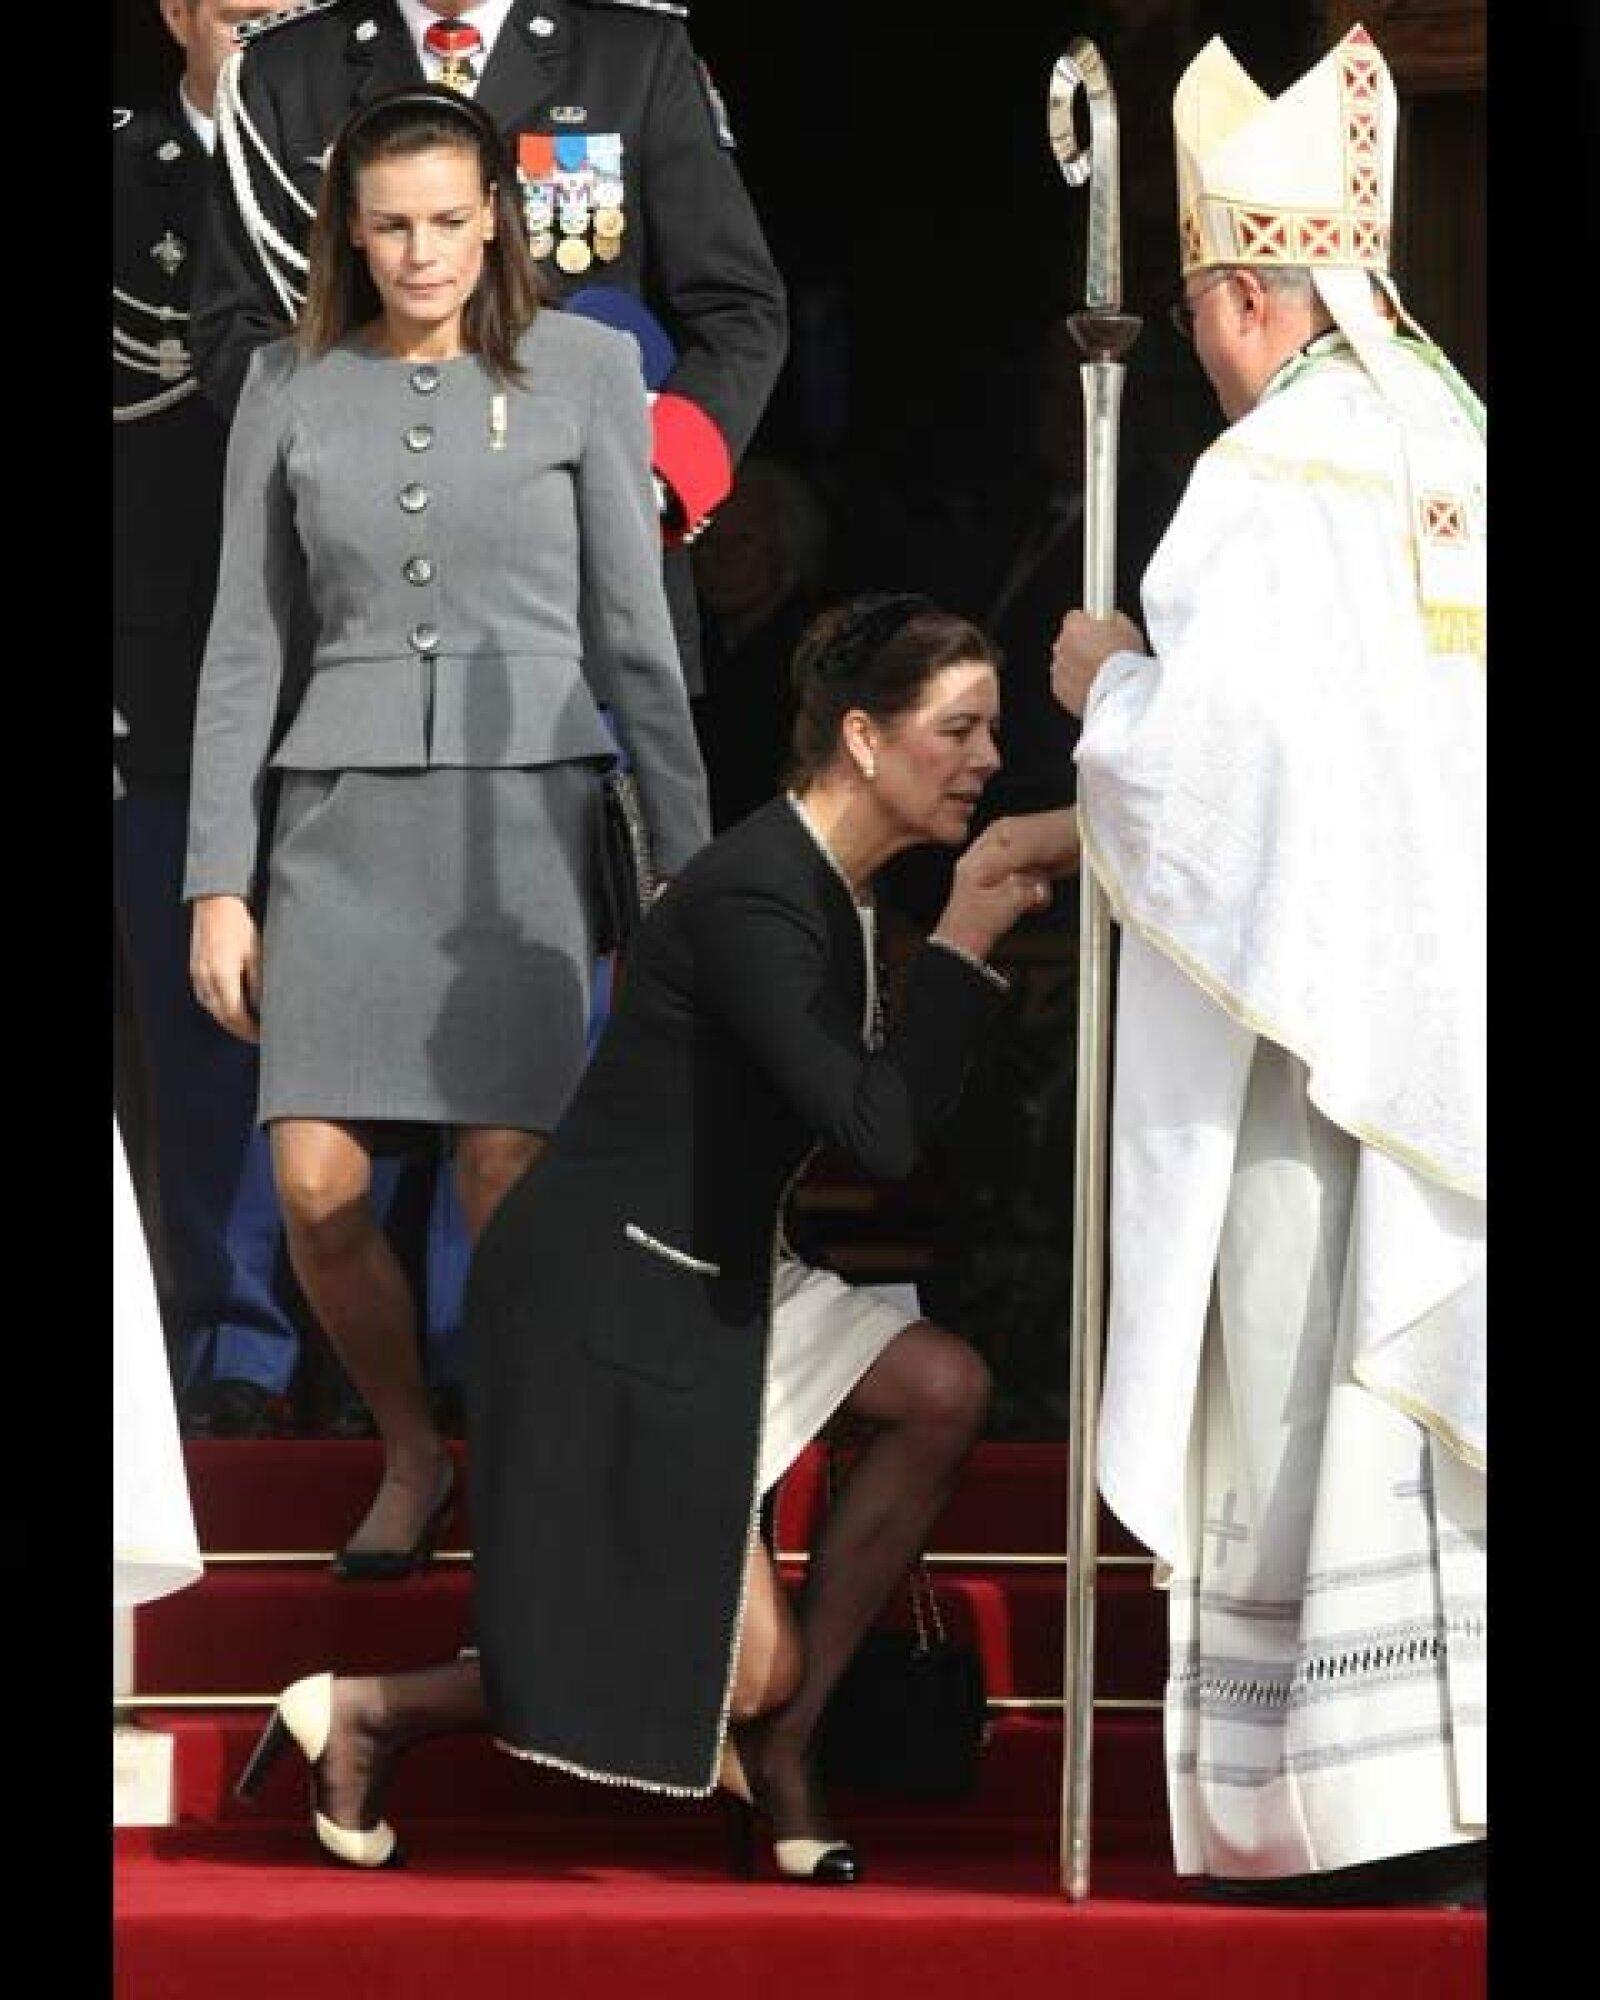 La princesa Carolina de Hanover besando la mano del arzobispo Bernard Barsi.